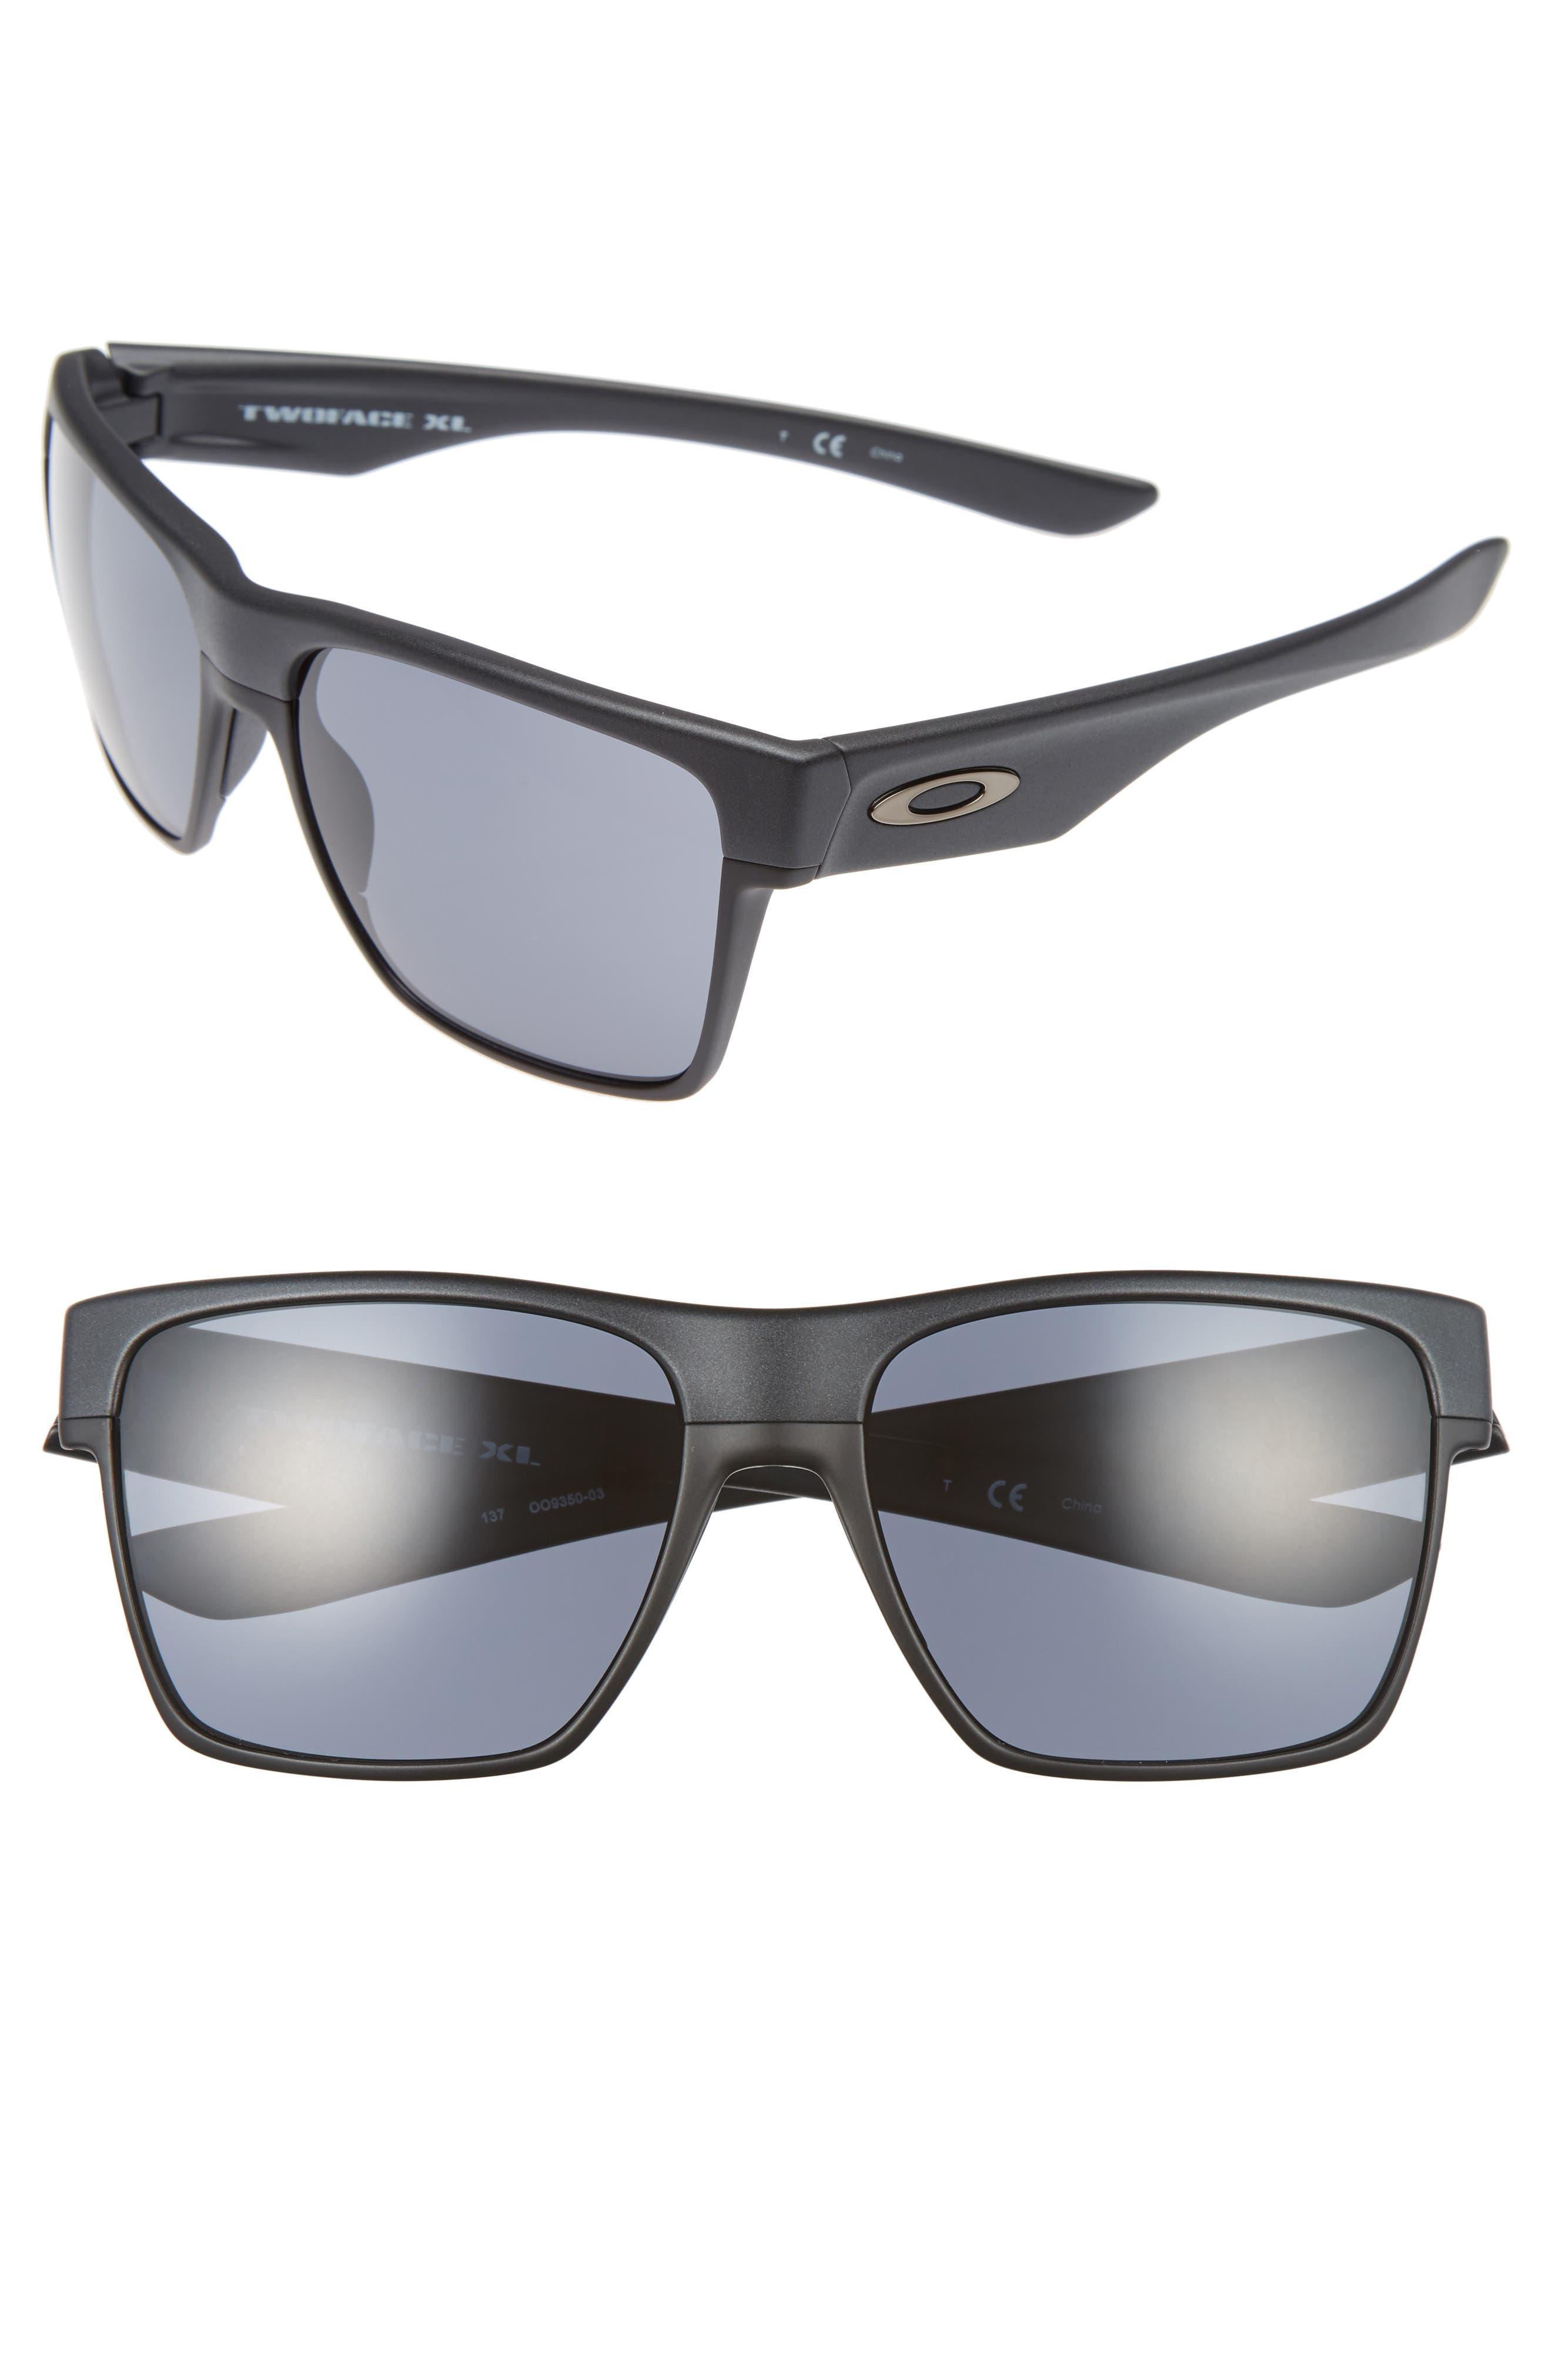 OAKLEY Twoface<sup>™</sup> XL 59mm Sunglasses